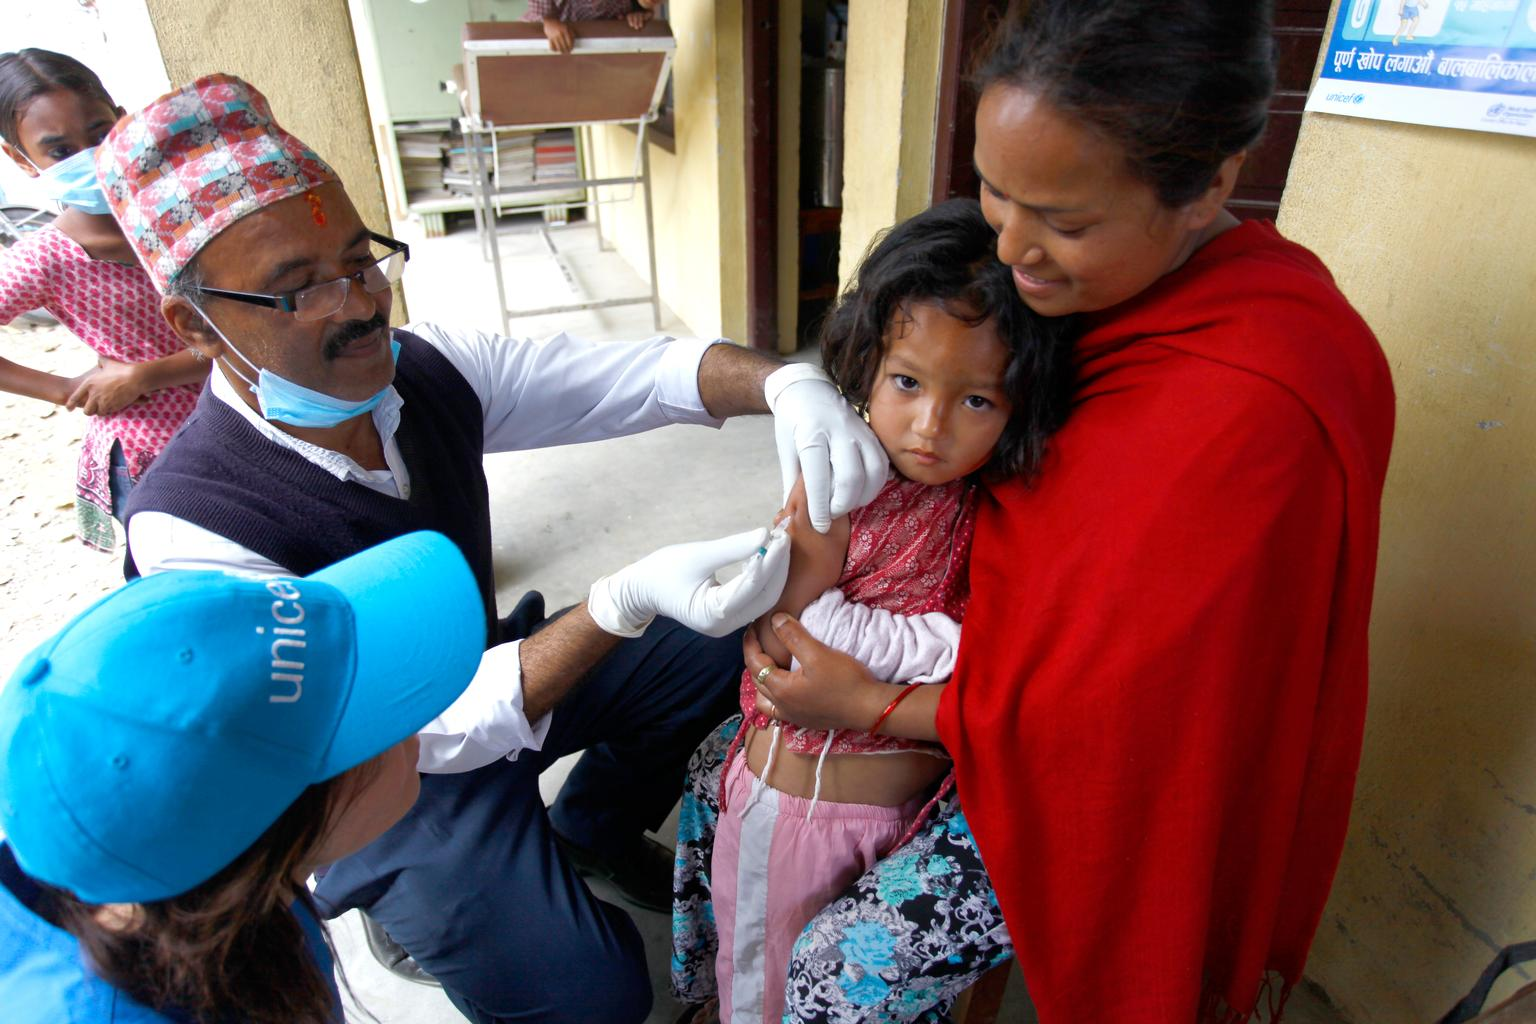 Neisha Shakya, 4, receives a measles and rubella vaccination. © UNICEF/NYHQ2015-1107/Panday